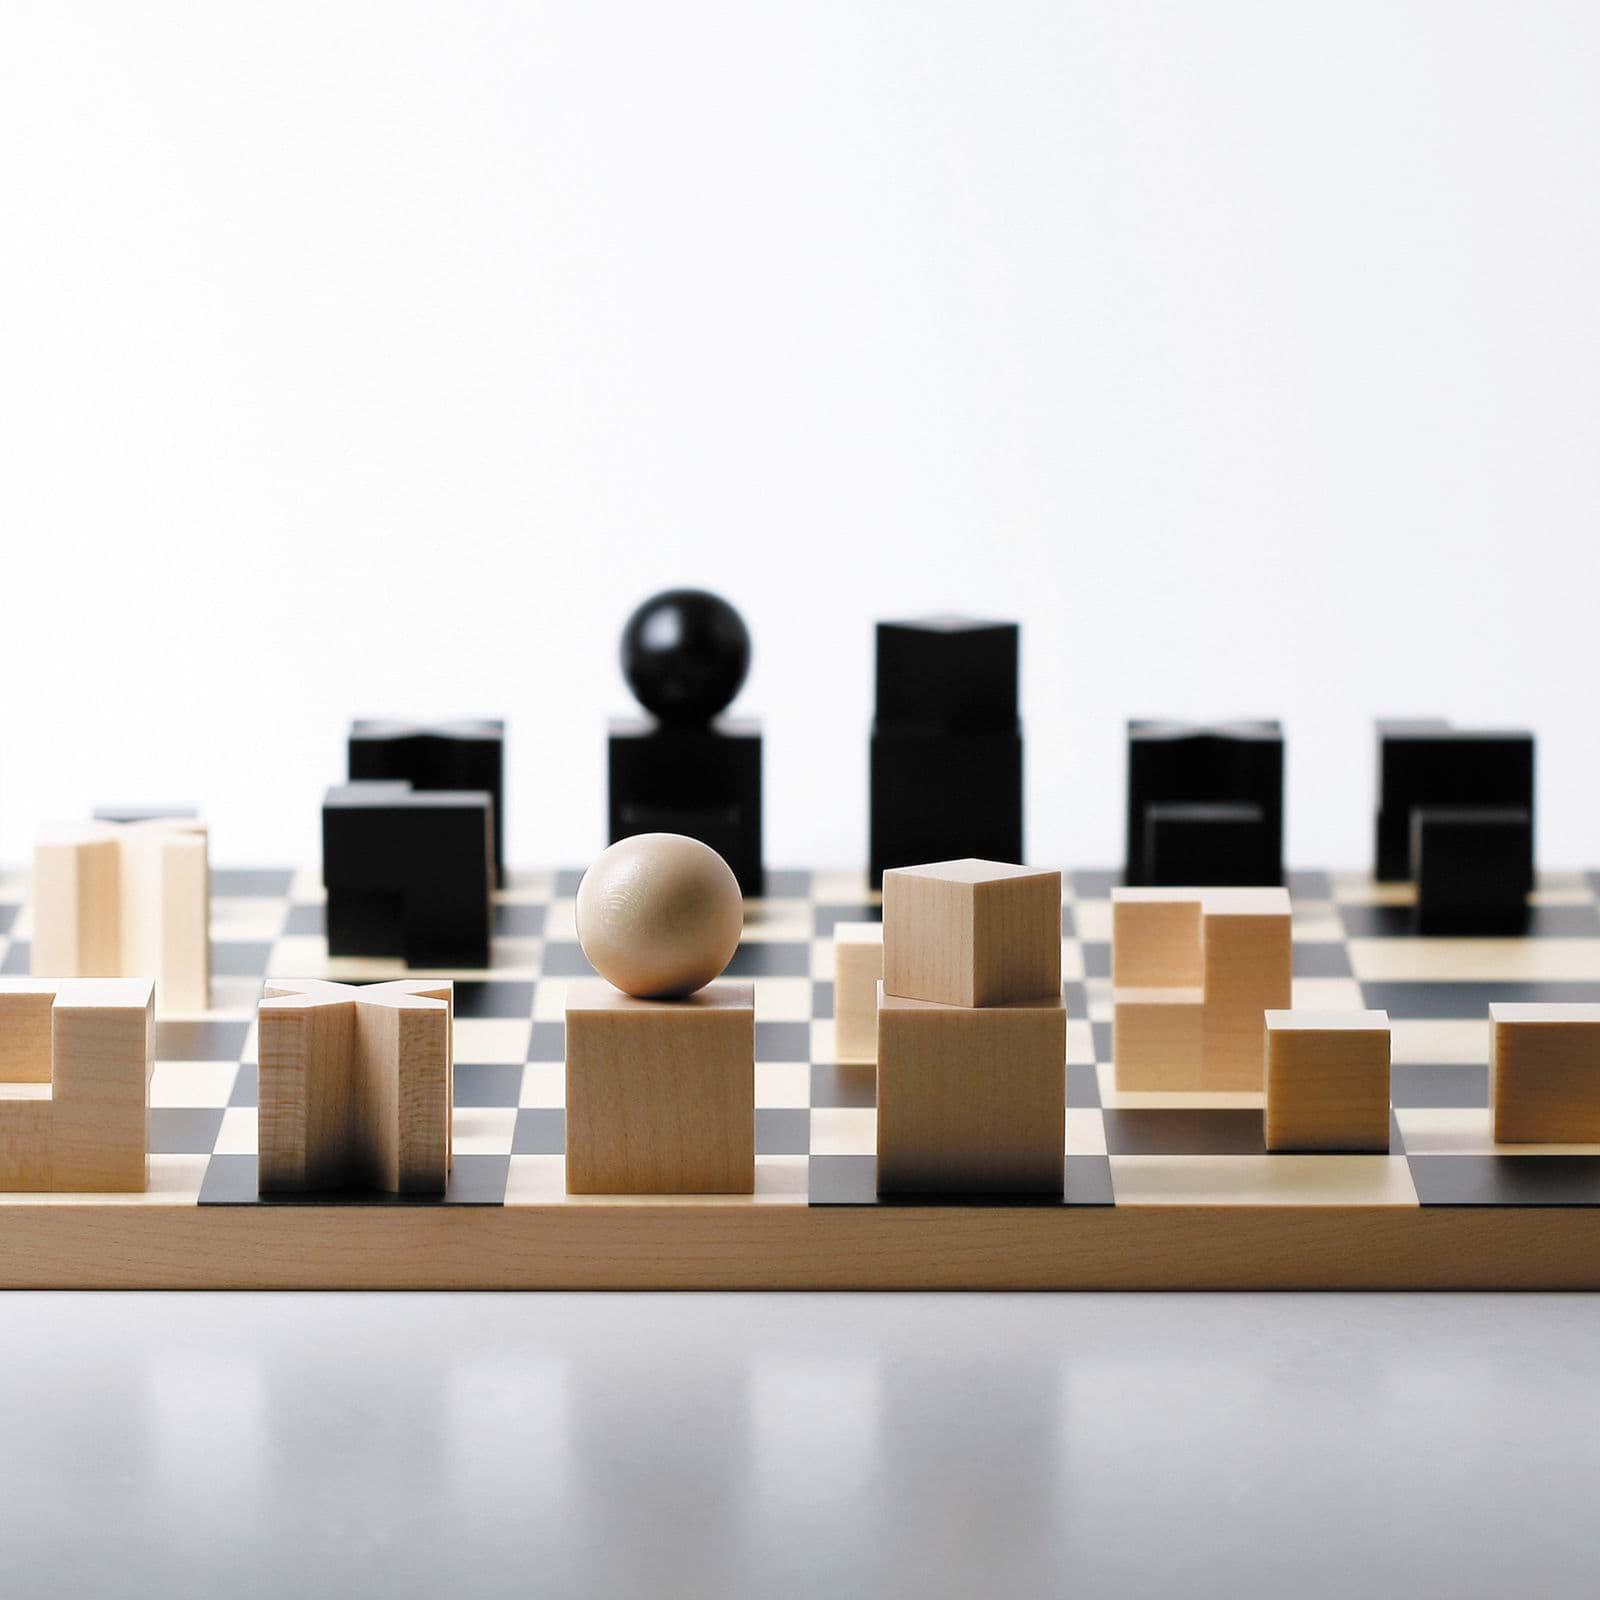 Shop Bauhaus Movement Bauhaus Chess Set By Josef Hartwig